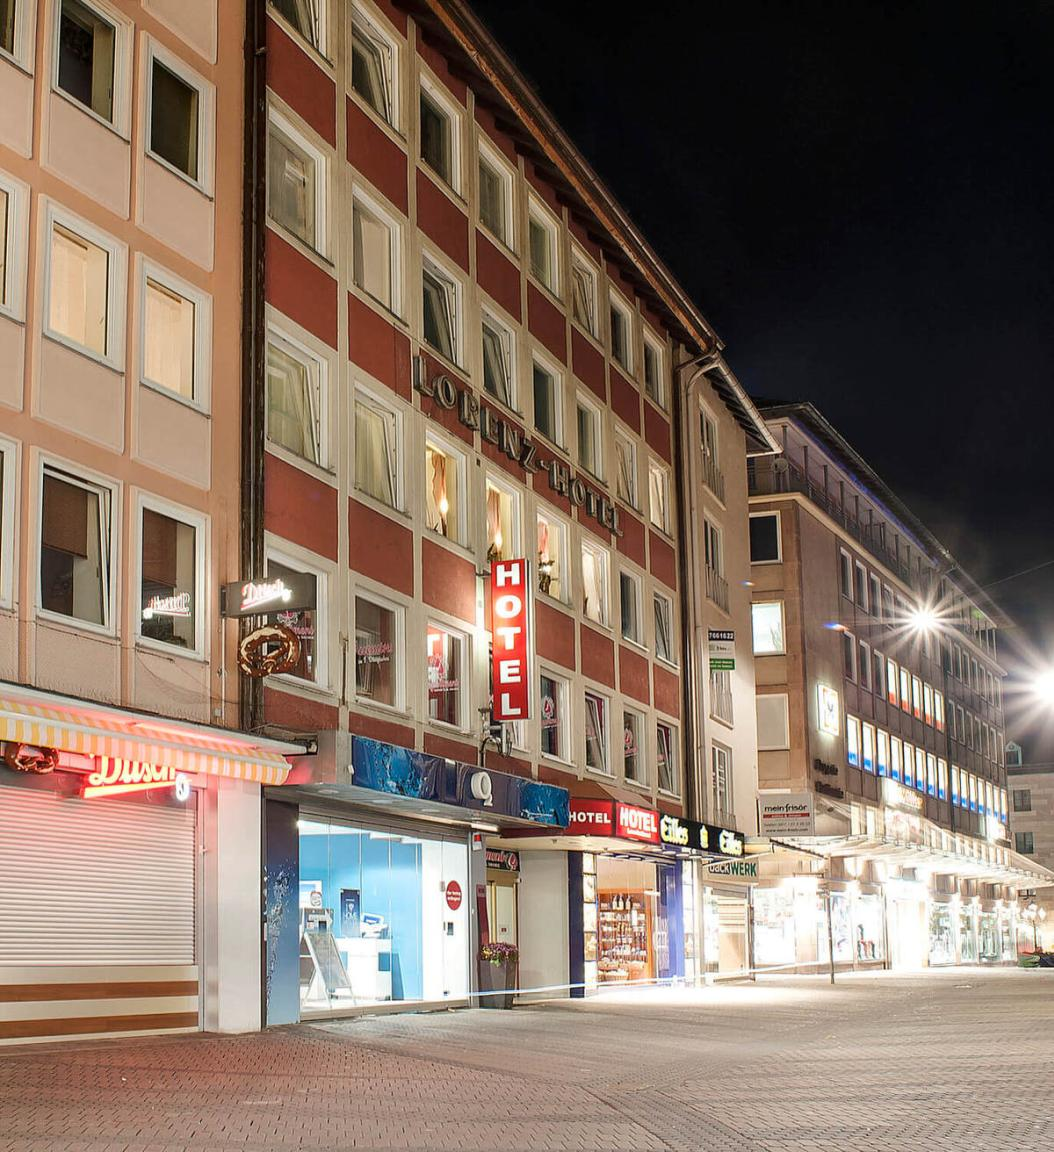 Hotel Garni Lorenz Hotel Zentral, 90402 Nürnberg-Lorenz